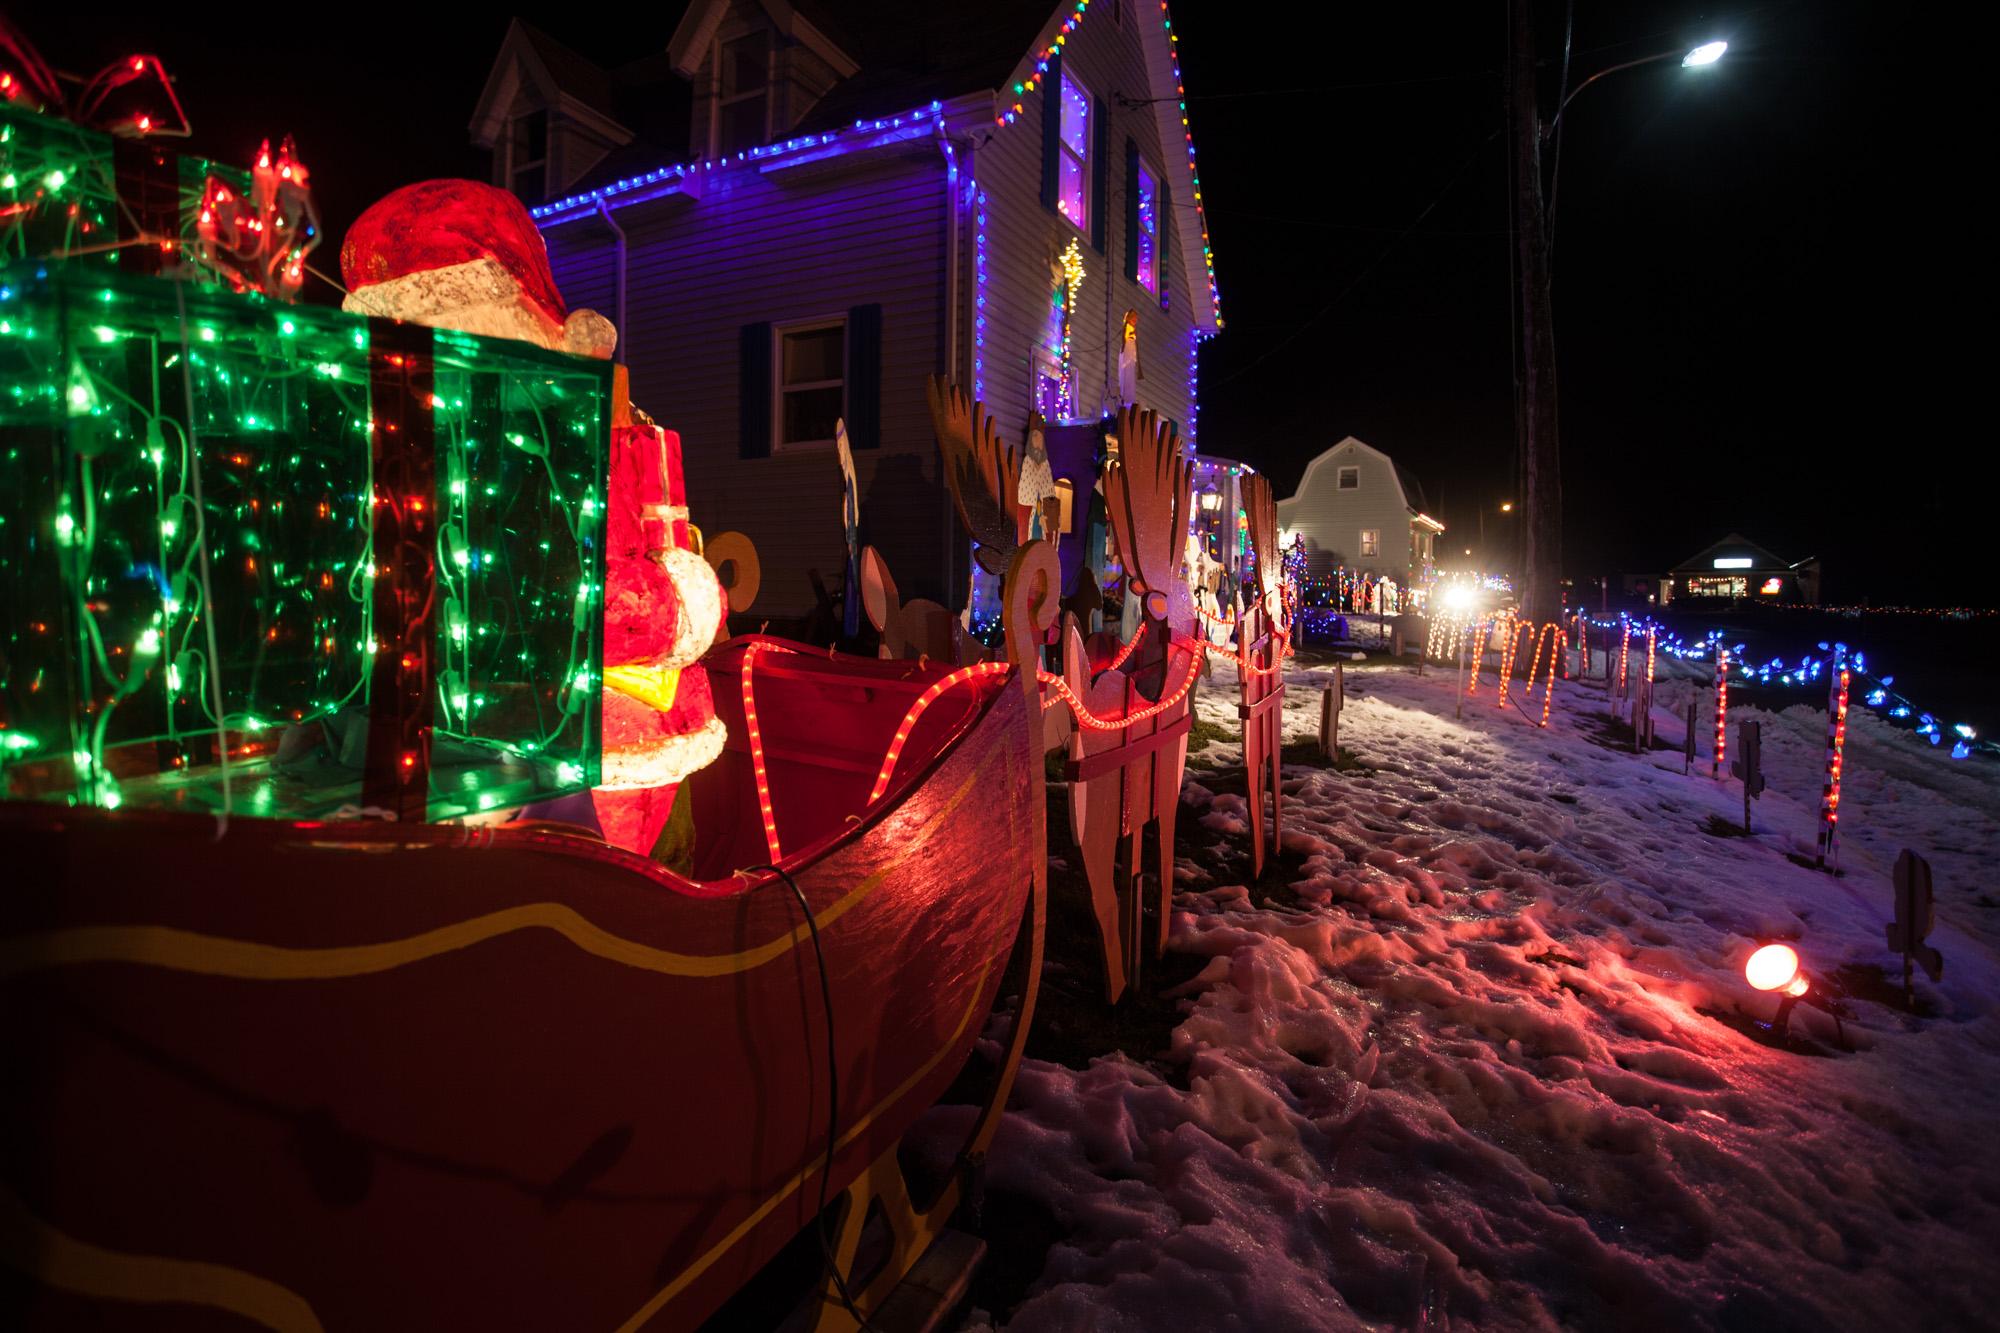 stratfords popular landons light show 13 beacon hill drive stratford - How To Make A Christmas Light Show